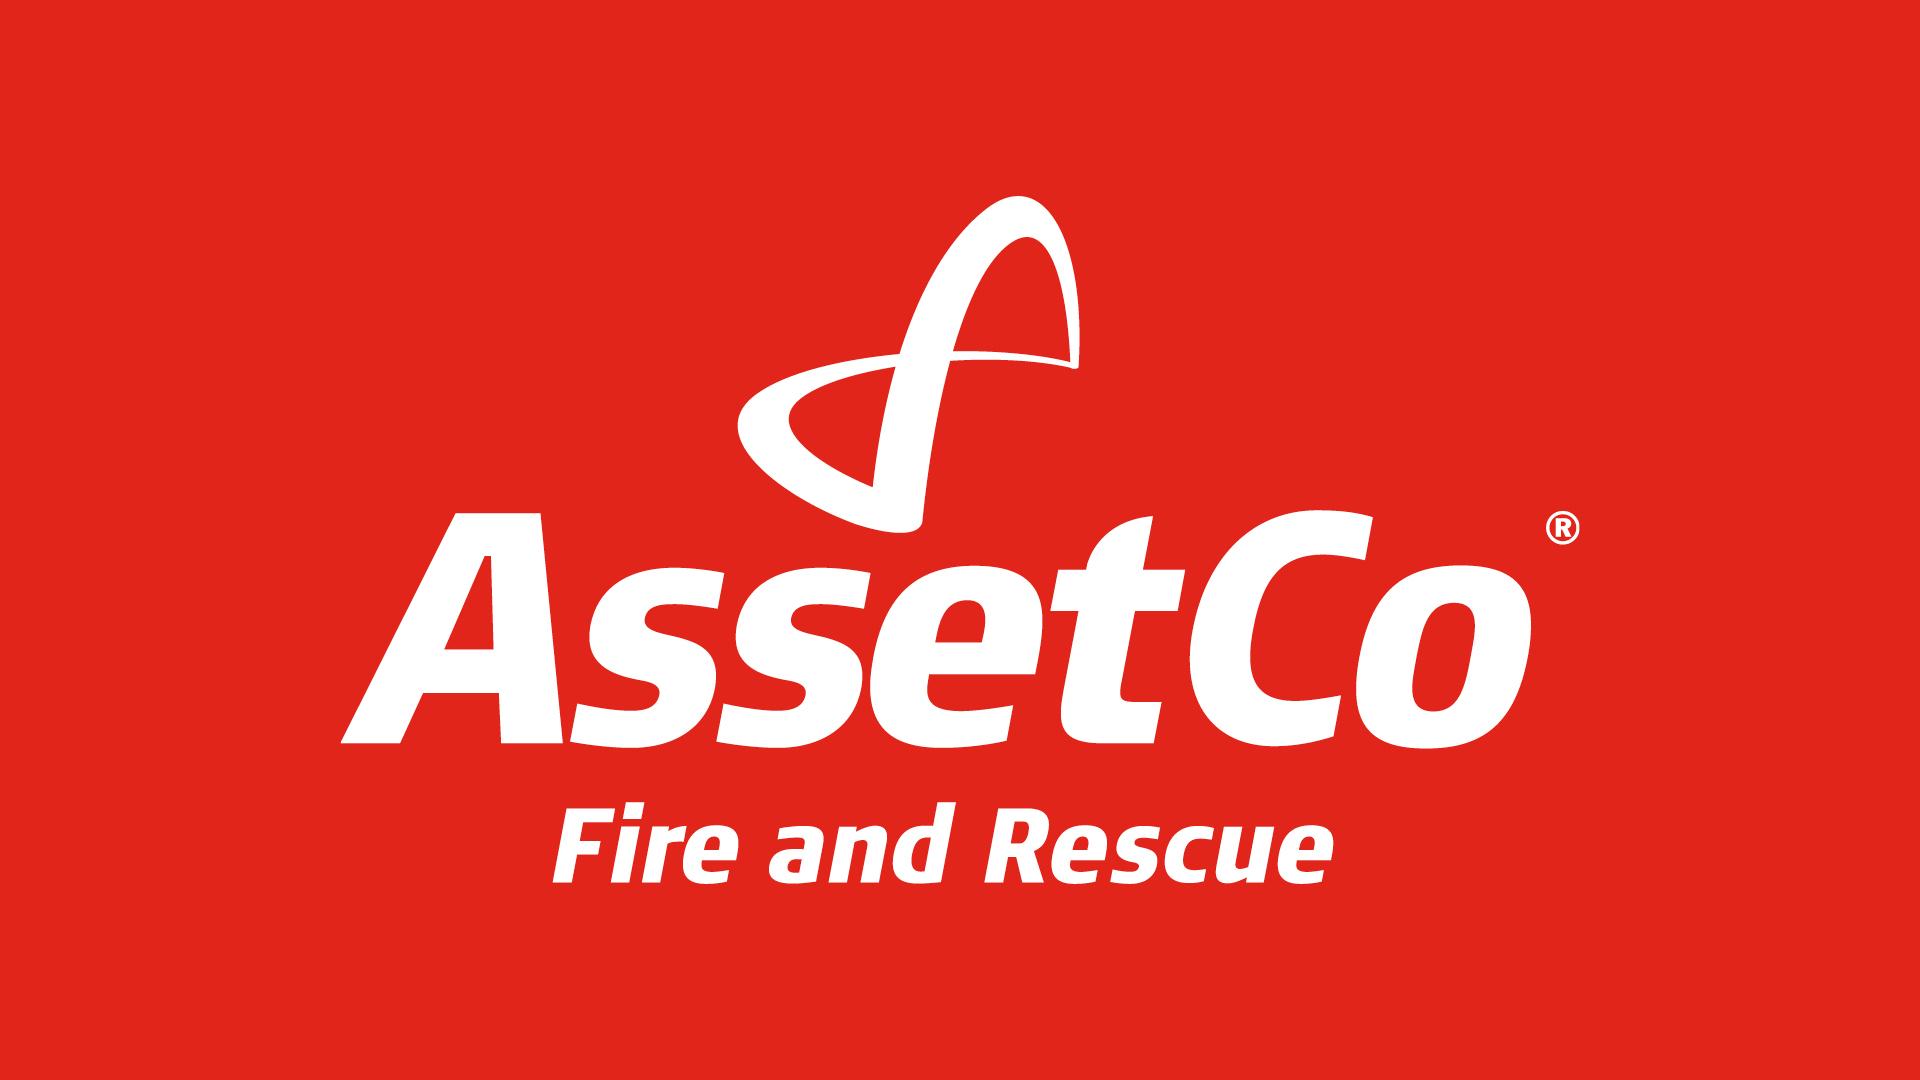 AssetCo Corporate Identity